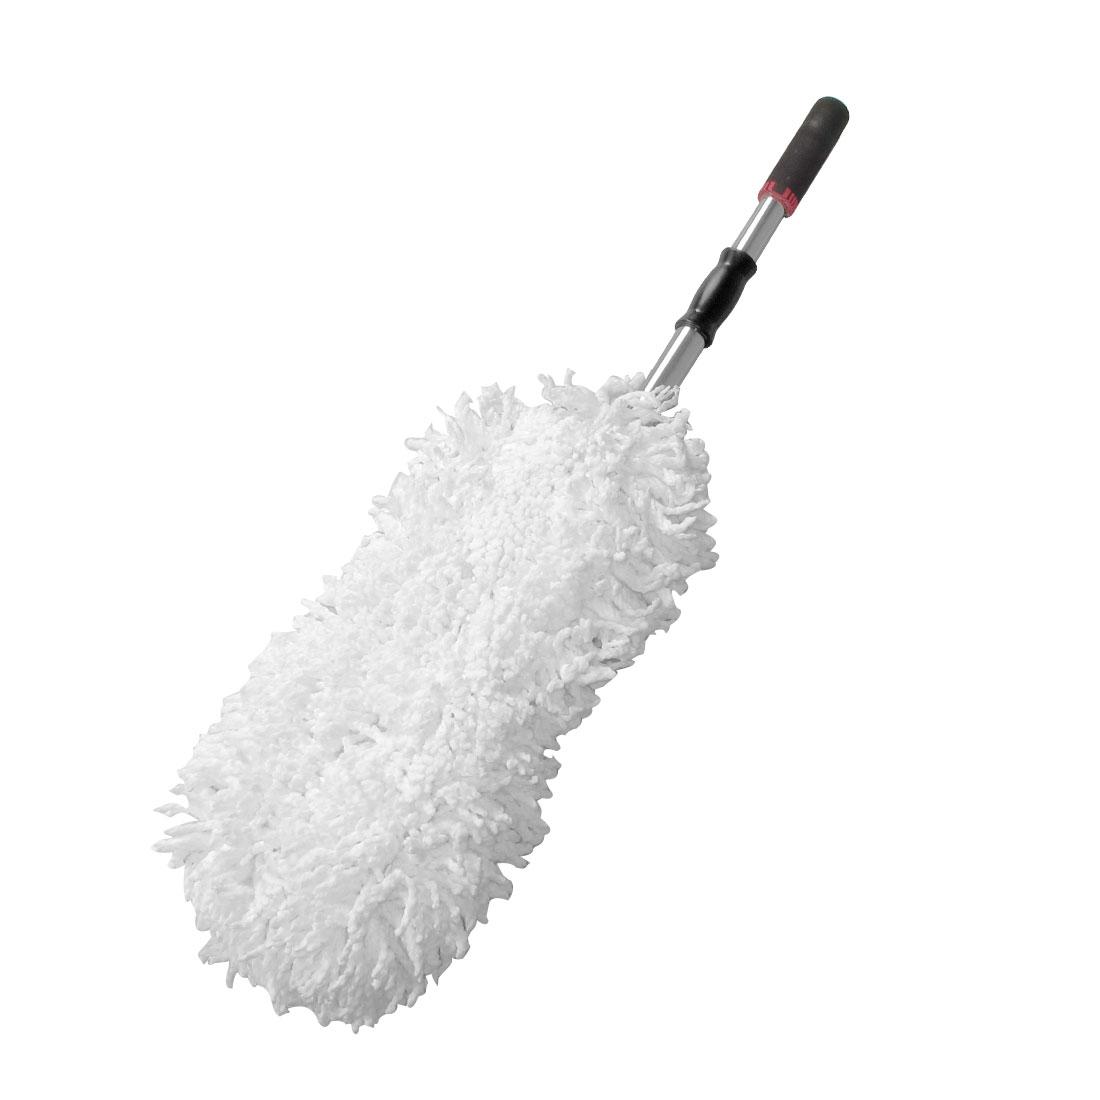 Telescopic Foam Coated Handle Car Microfiber Cleaning Waxing Duster Bush